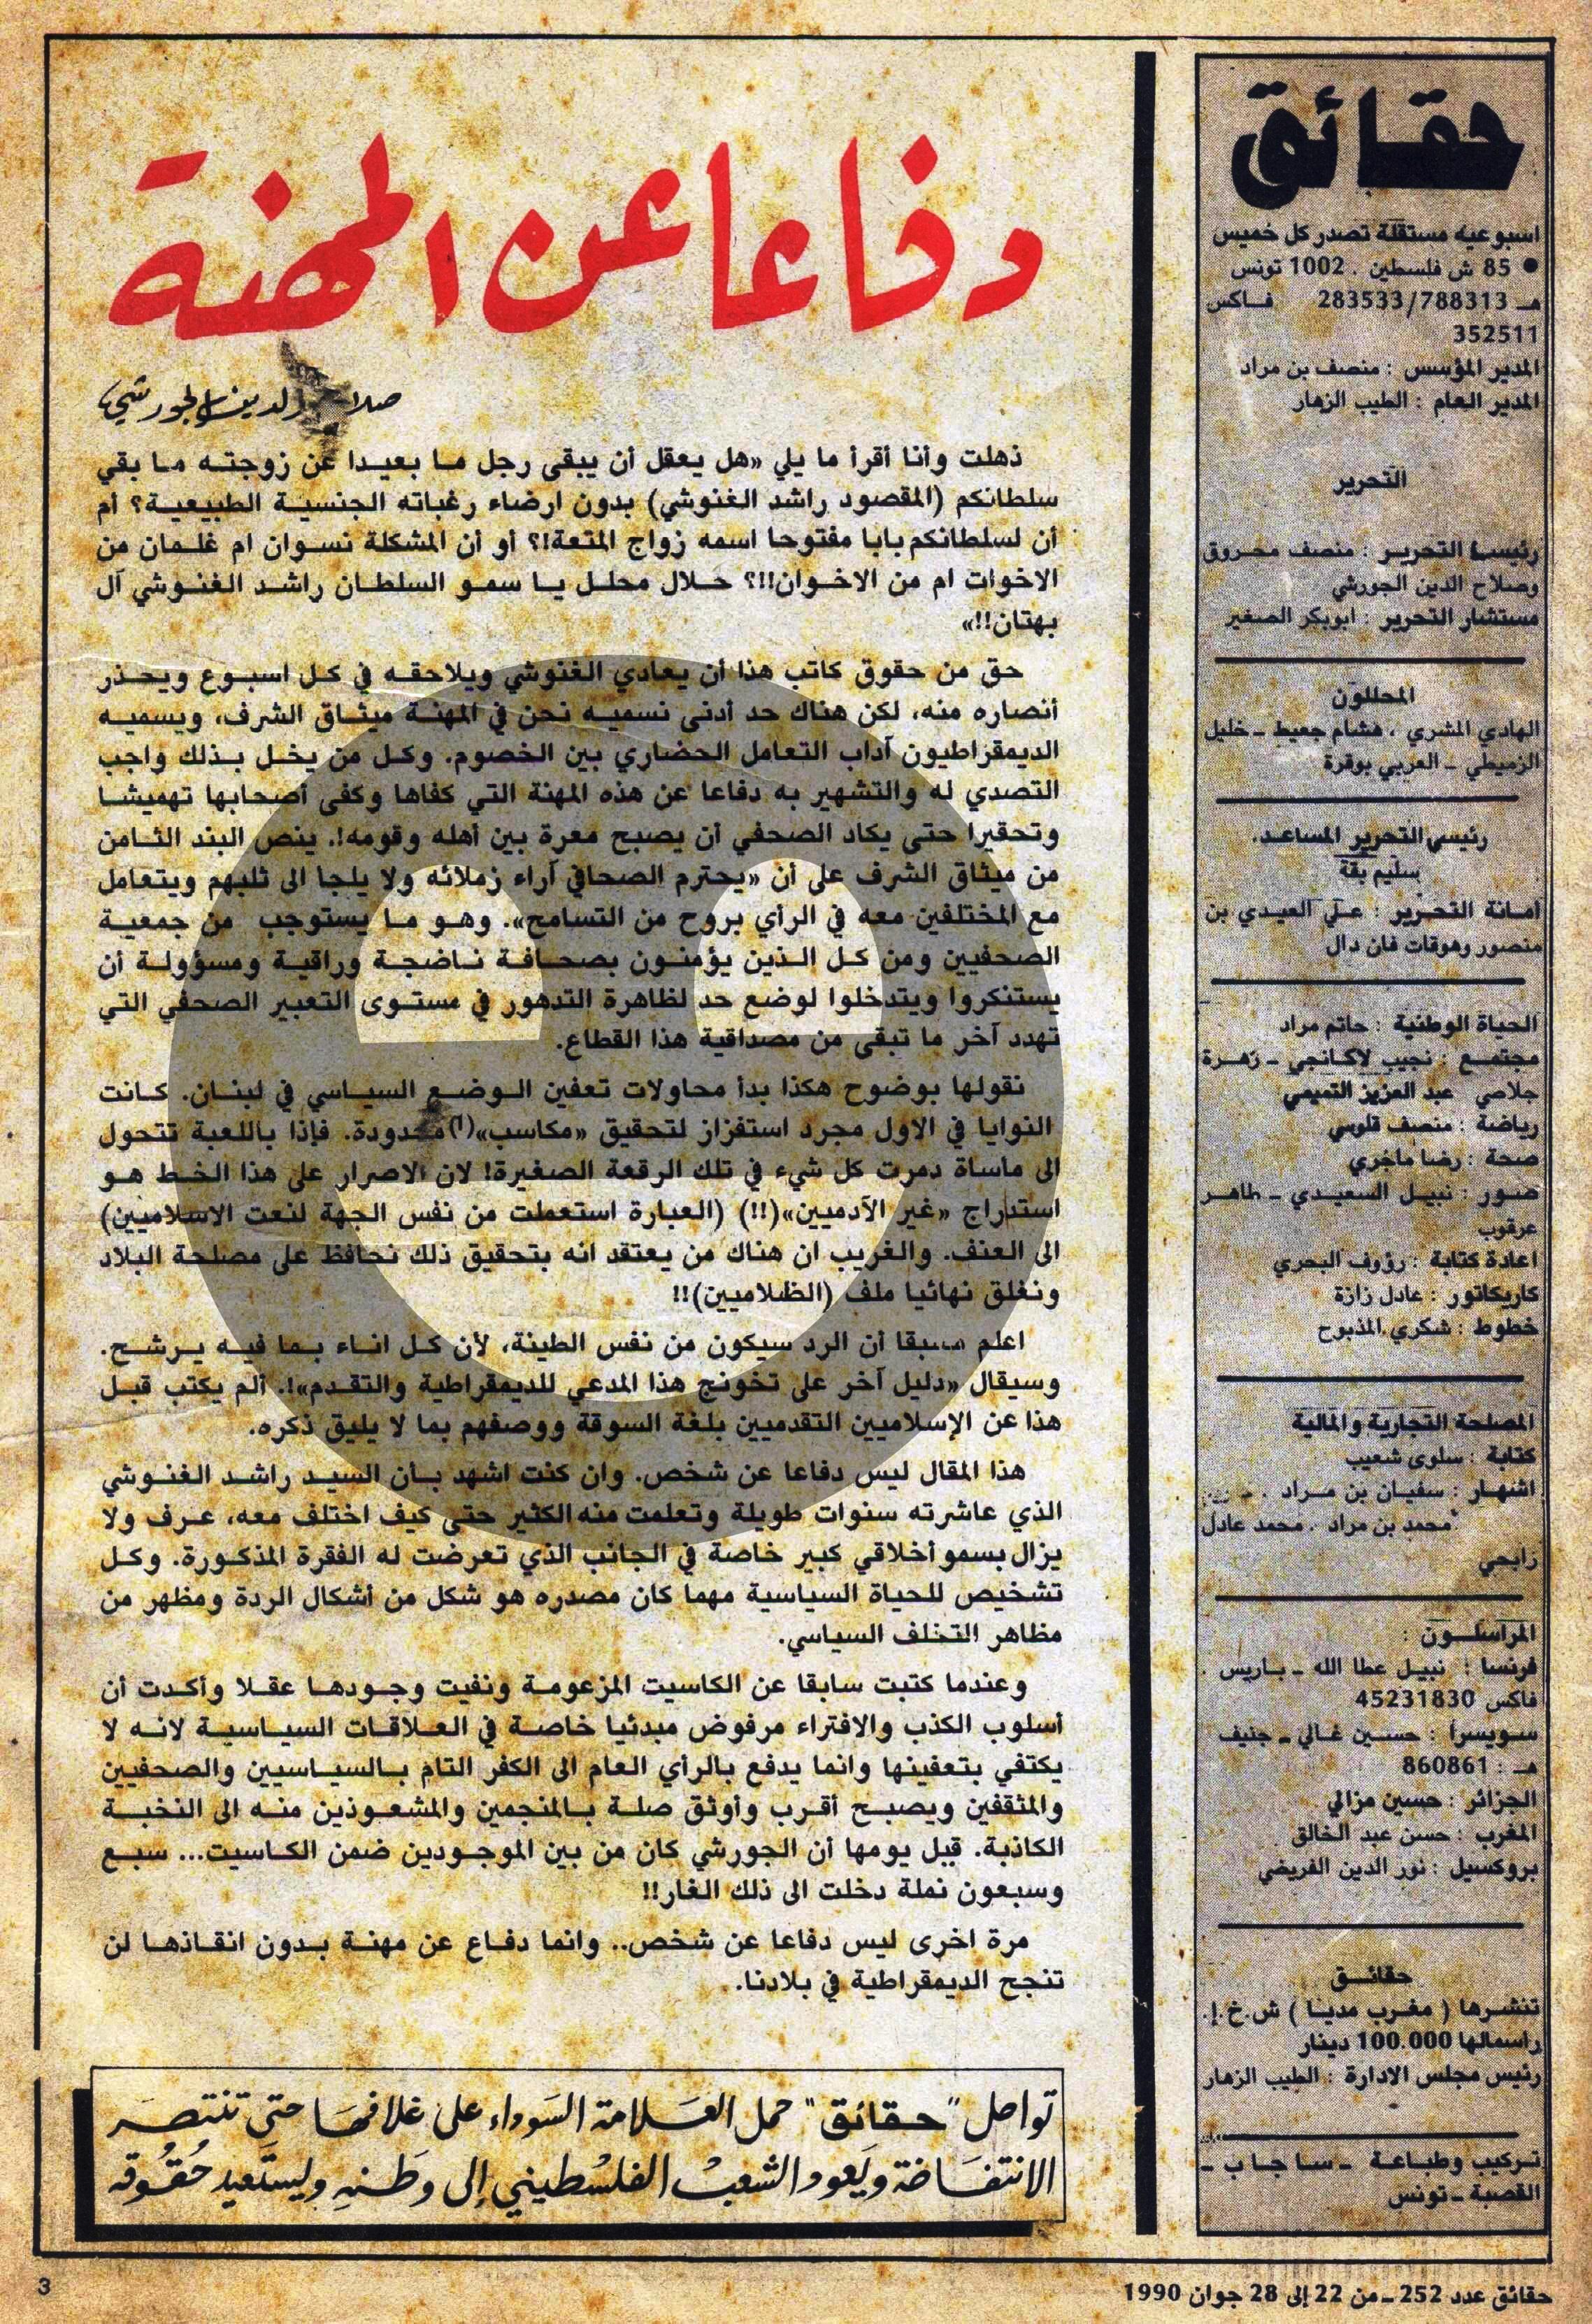 slahddine jourchi,liberté de la presse,tunisie,1989,2012,